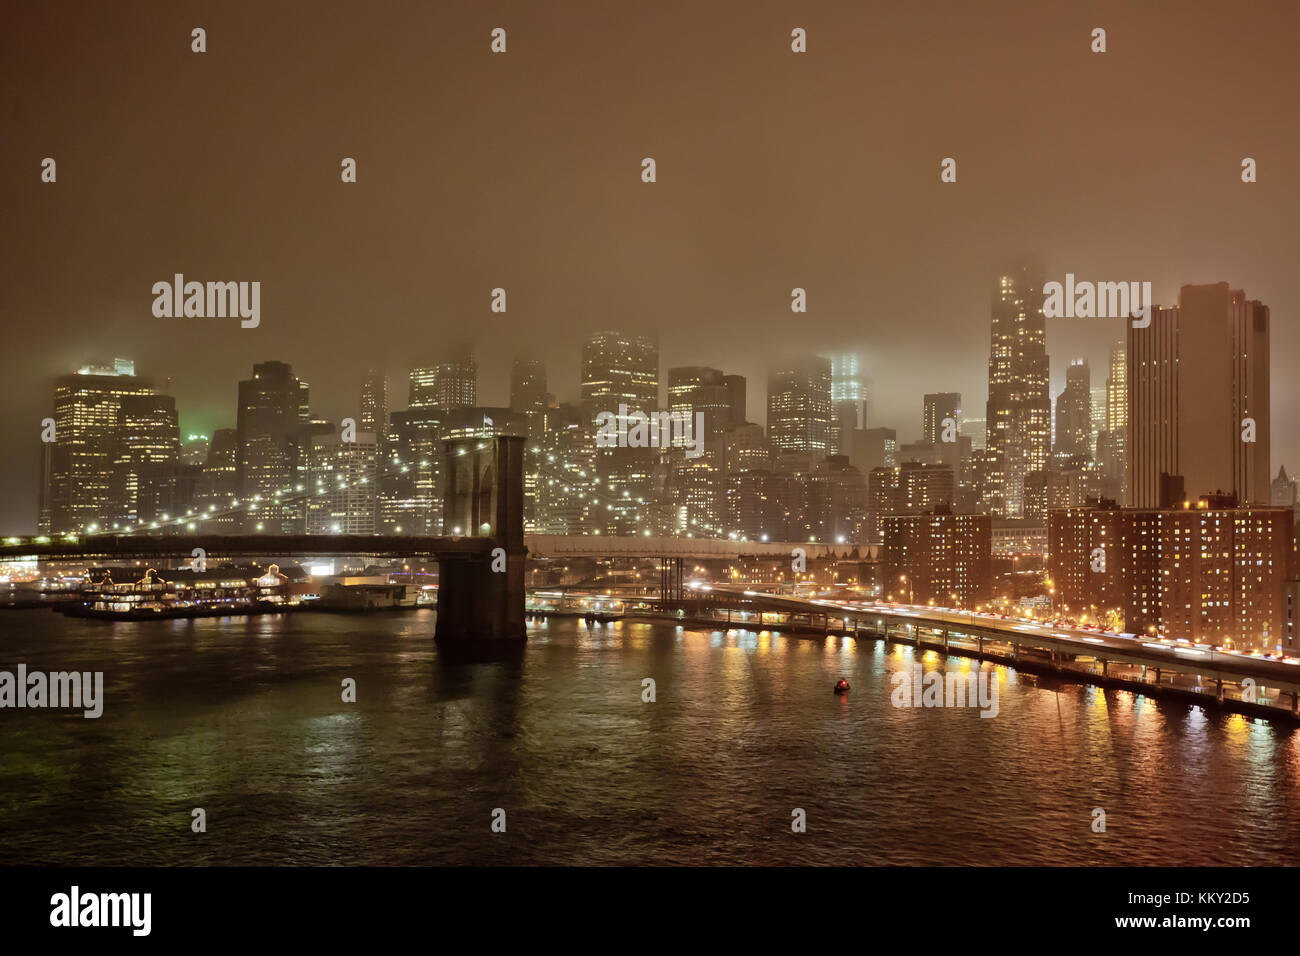 Brrokly Brücke - New York City - Vereinigte Staaten - USA Stockfoto